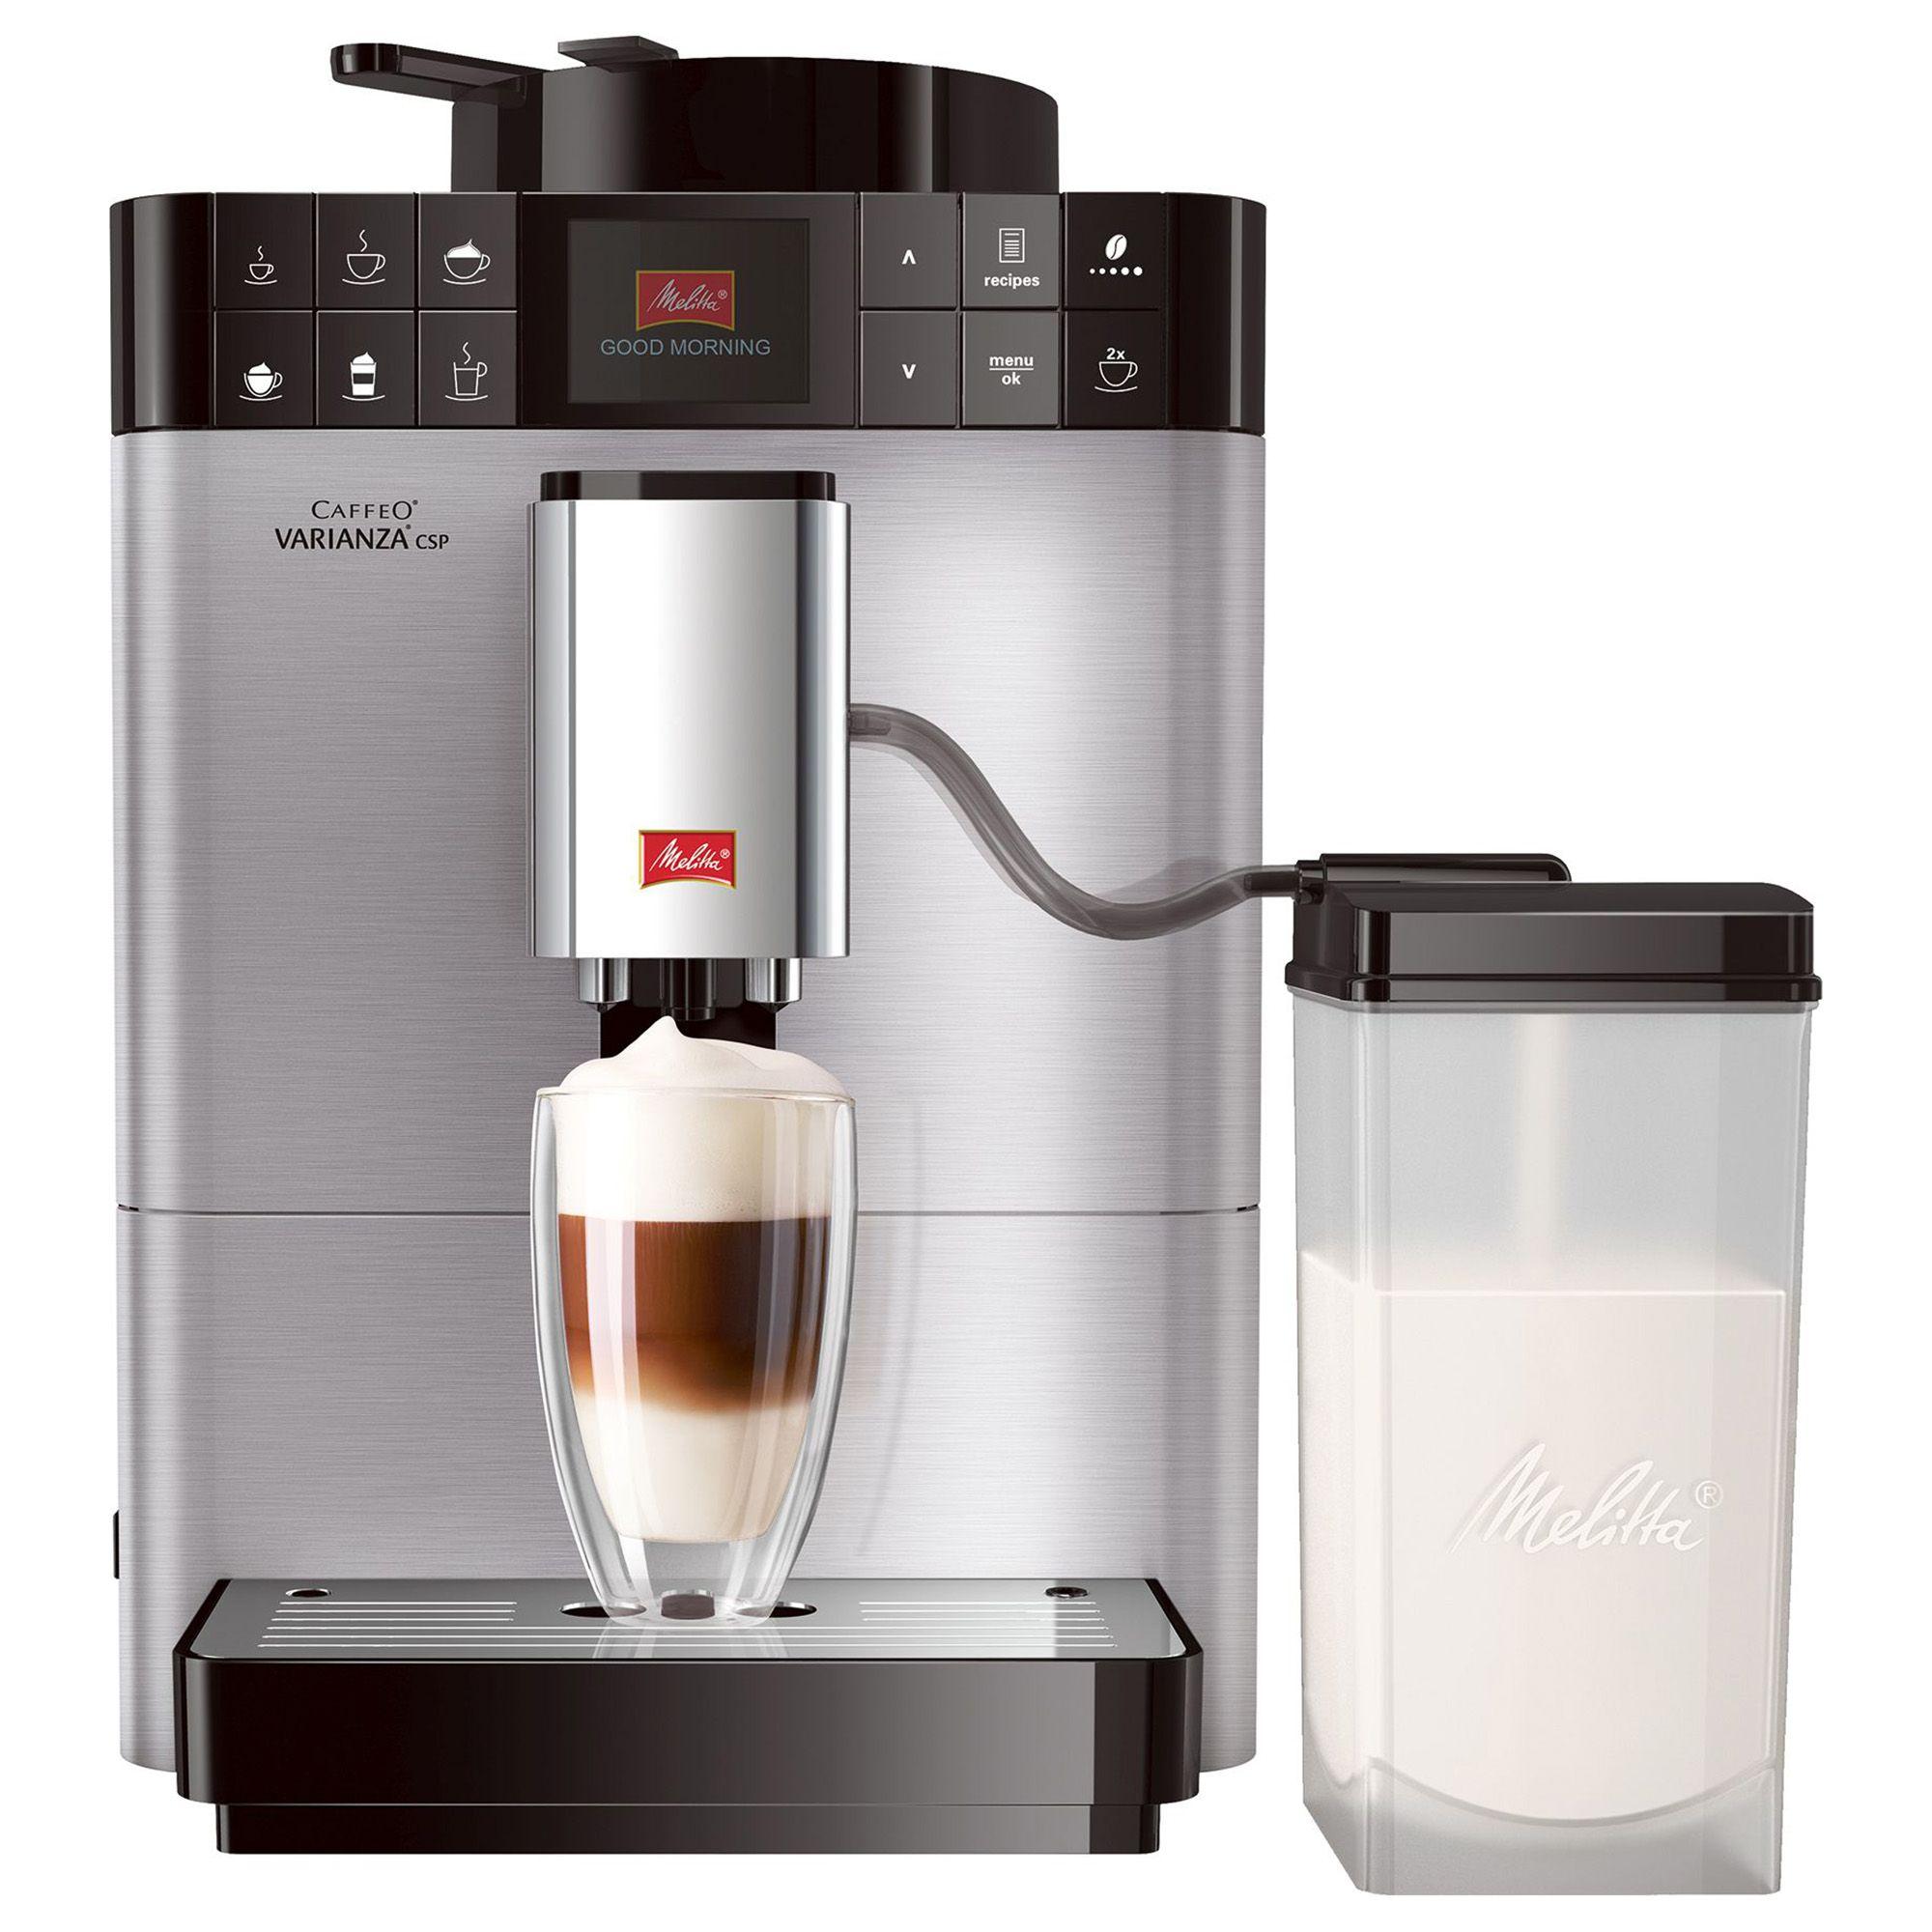 MELITTA Kaffeevollautomat Edelstahl inkl 3 Kaffeesorten & Pflege